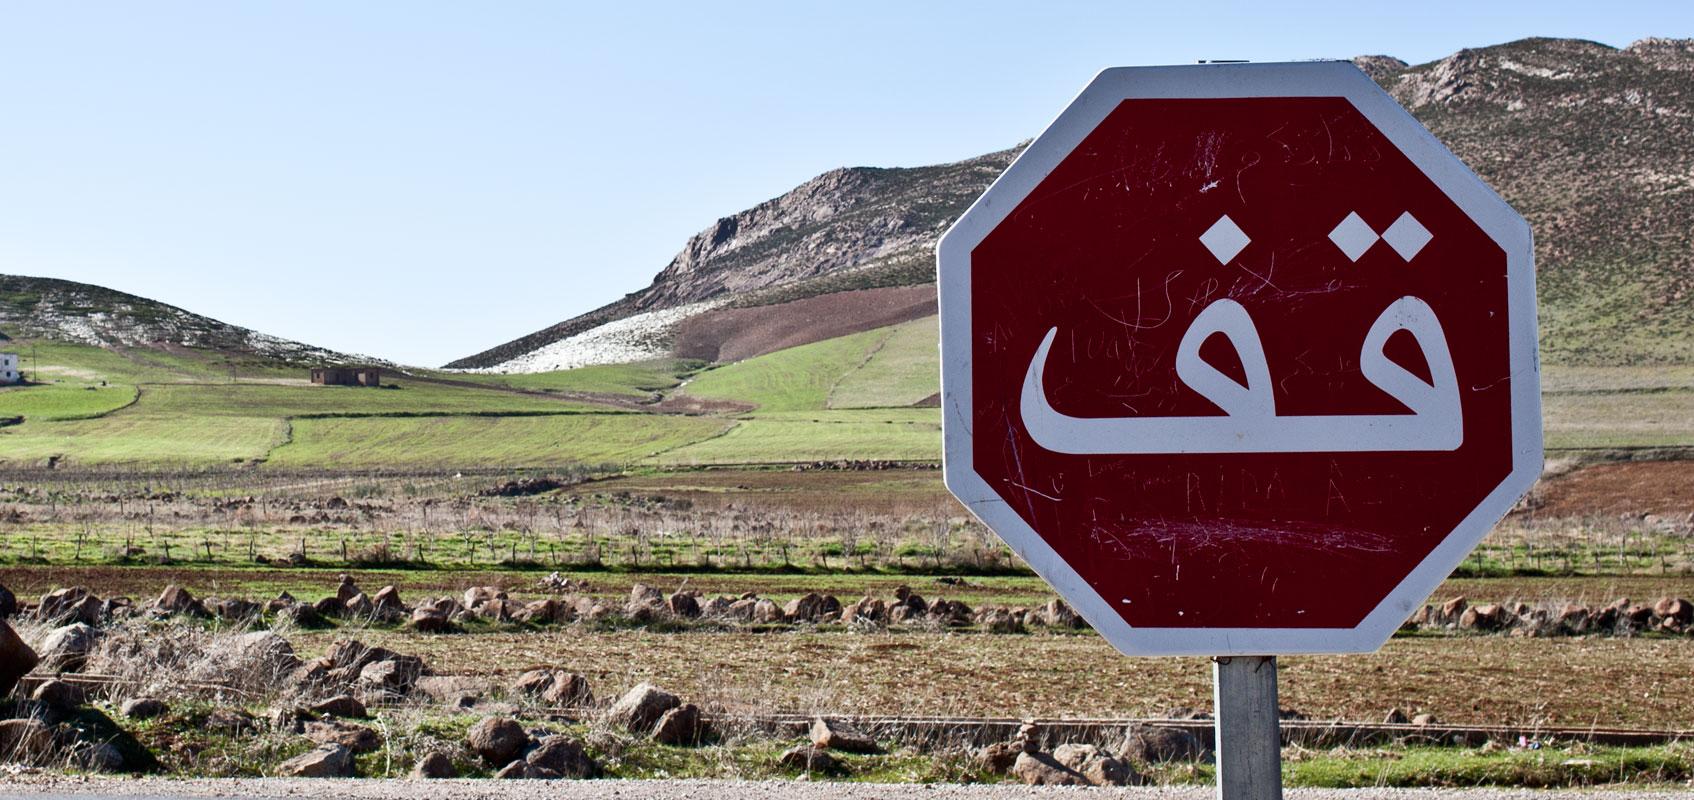 veronica_perez_granado_photography_periodista_fotografa_viaje_maroc_marruecos_n